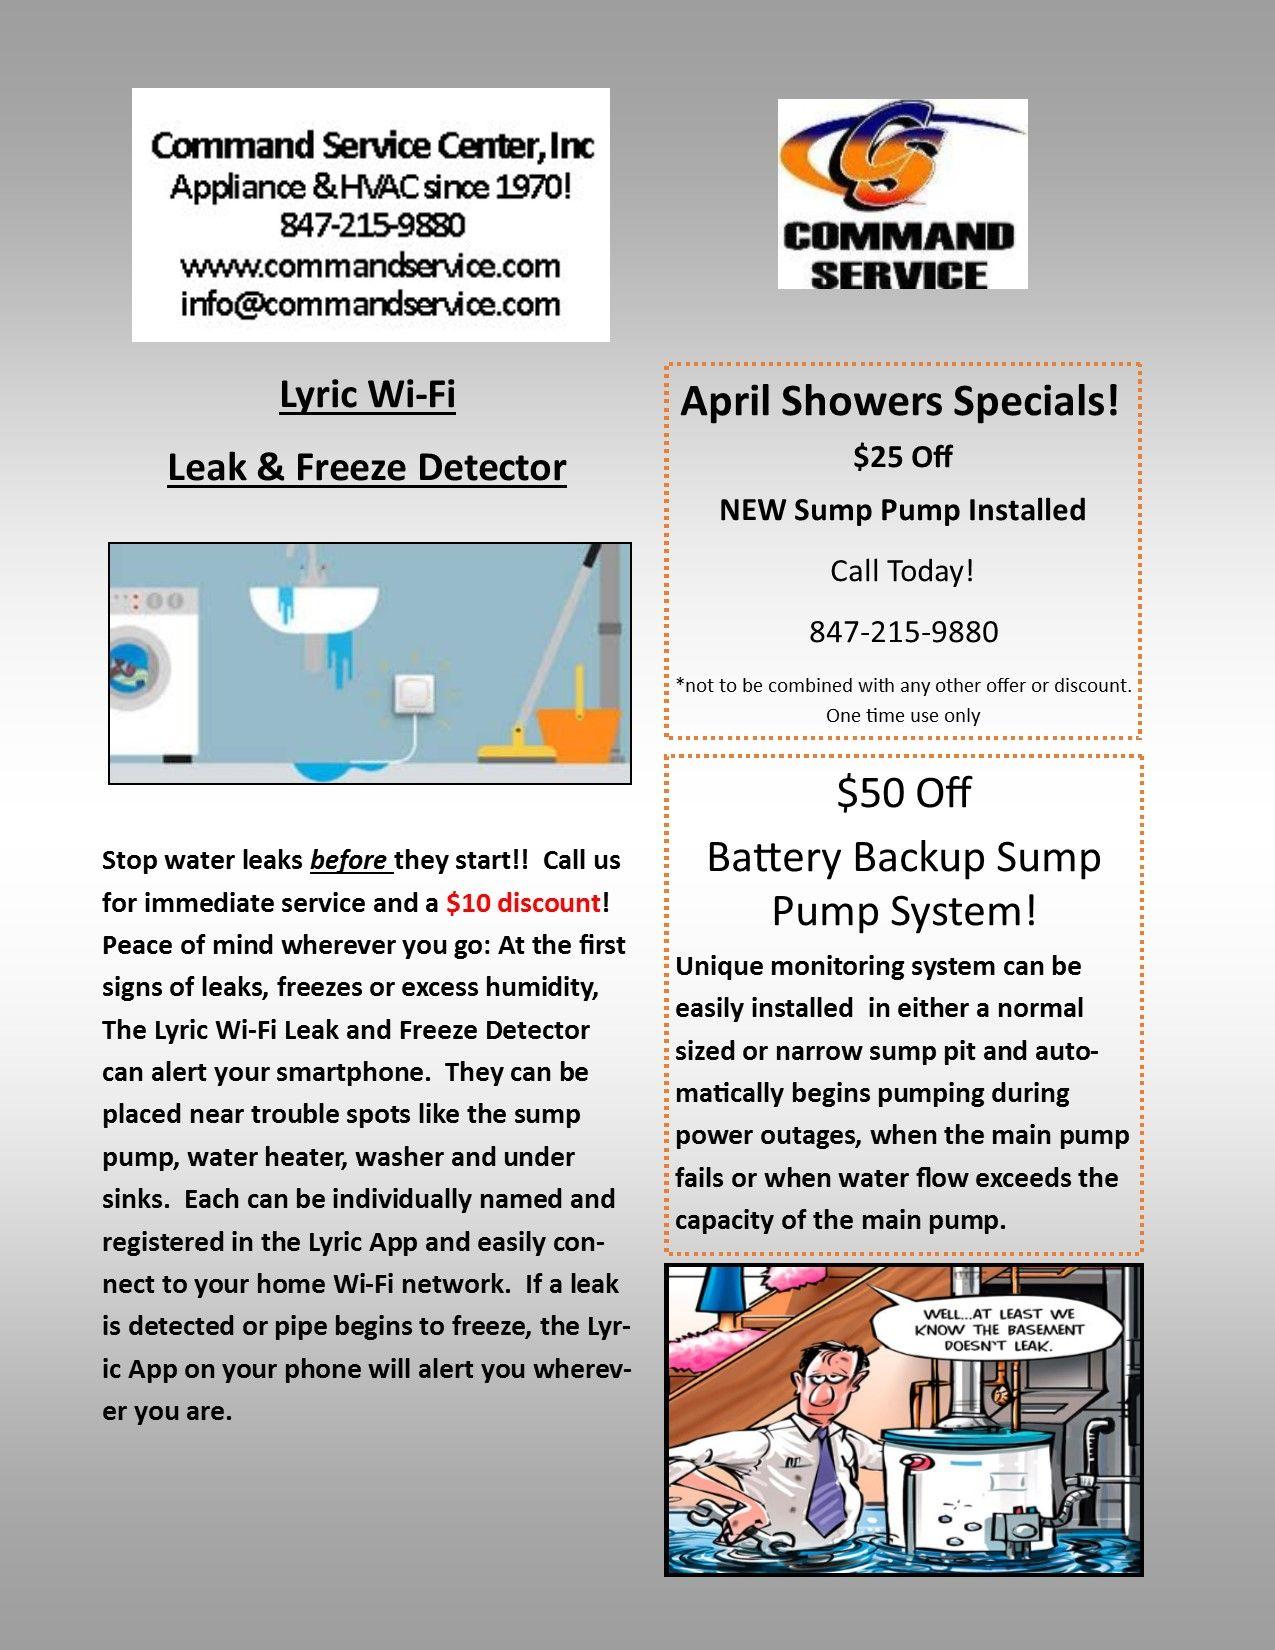 April Showers Special 25 Off New Sump Pump Installed Call Today 847 215 9880 Sump Pump April Showers Sump